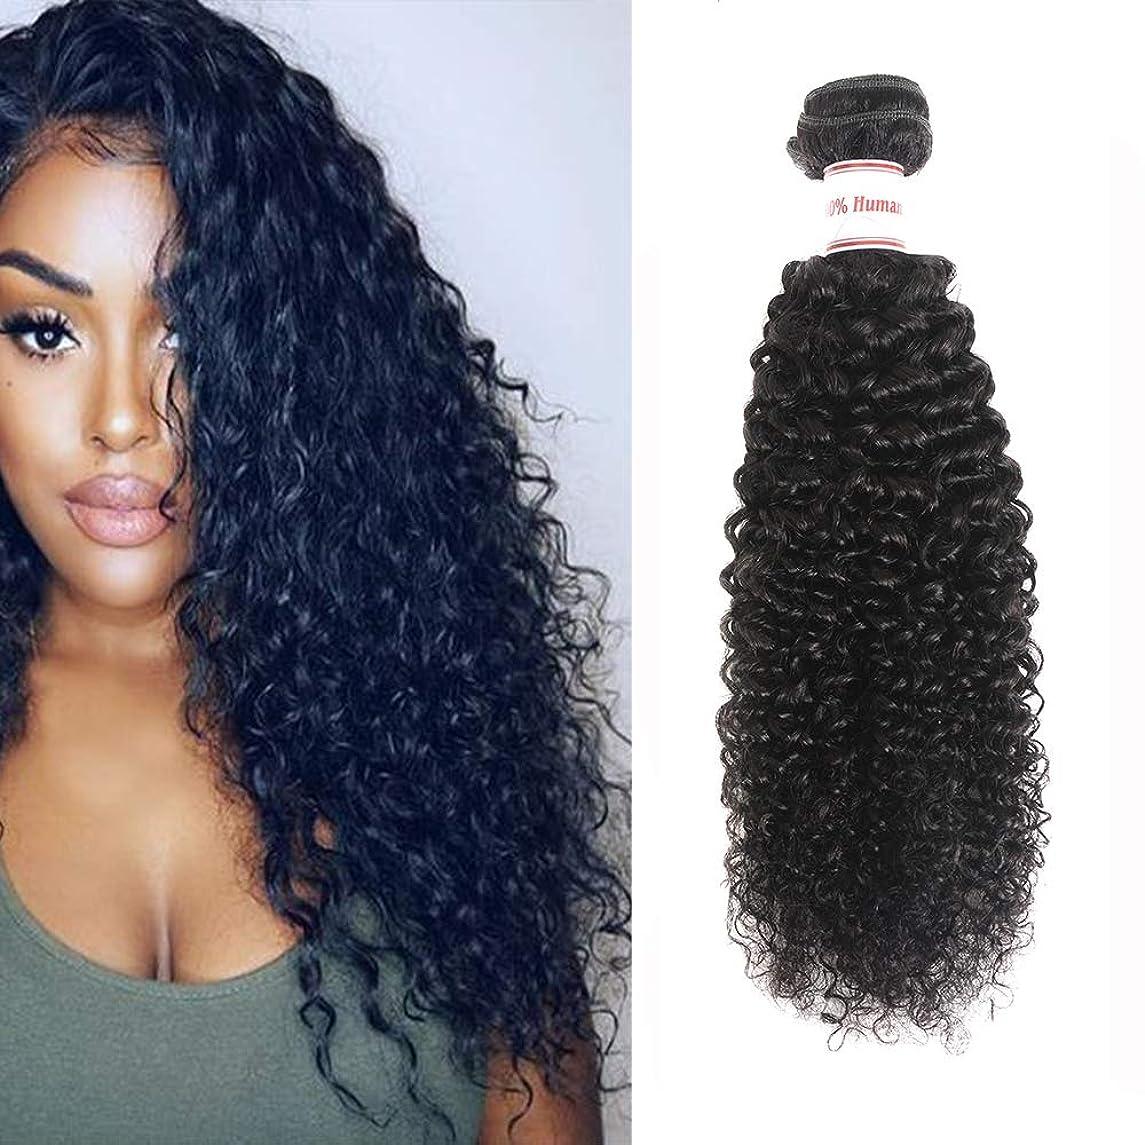 Brazilian Kinky Curly Virgin Hair 1 Bundles 100% Unprocessed Brazilian Curly Human Hair Weave 100g/lot Natural Black (22inch)